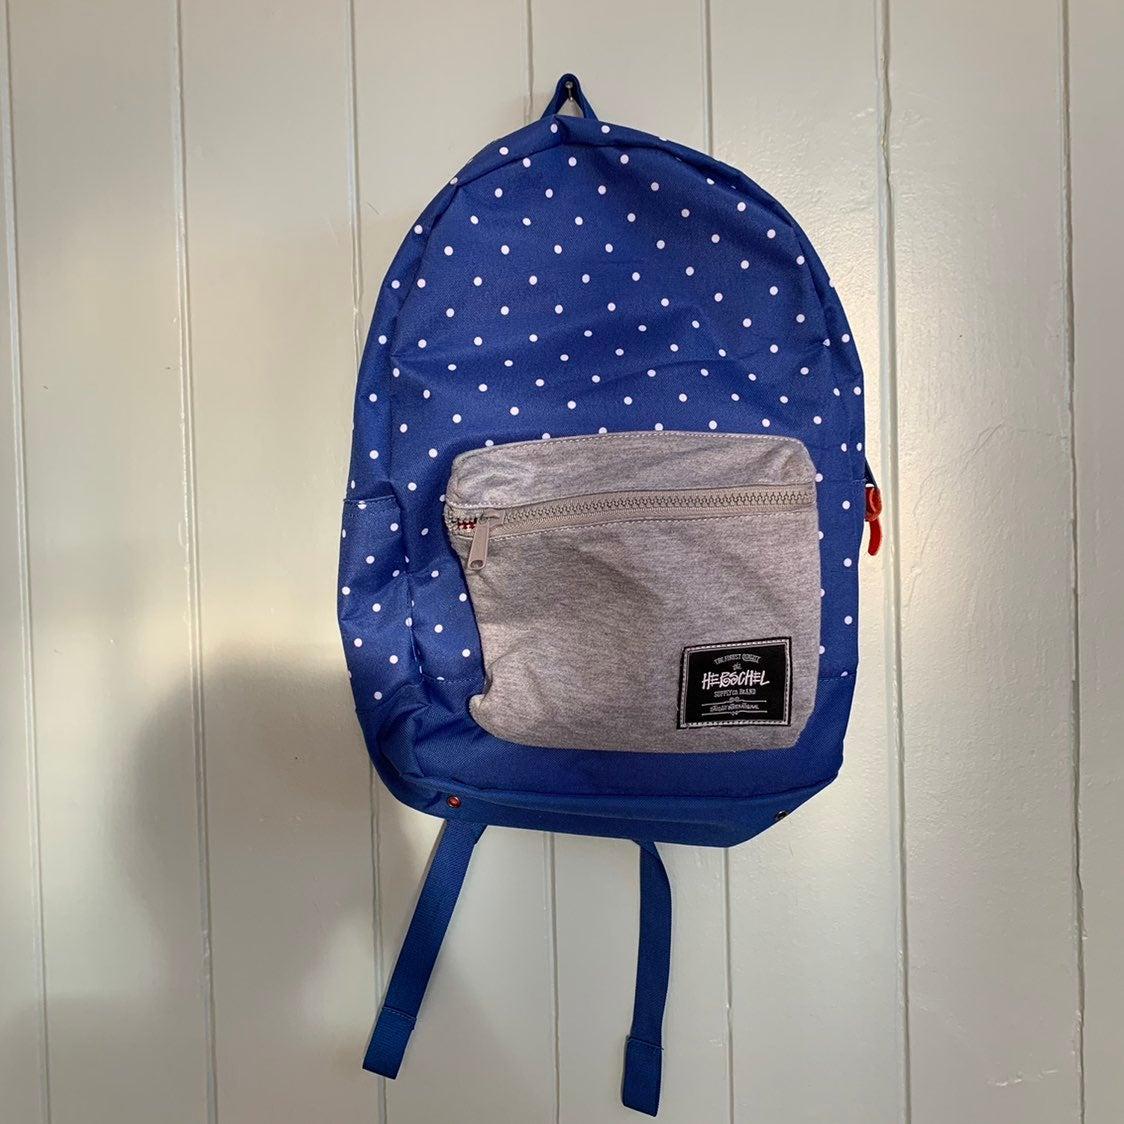 Herschel X Stussy Backpack